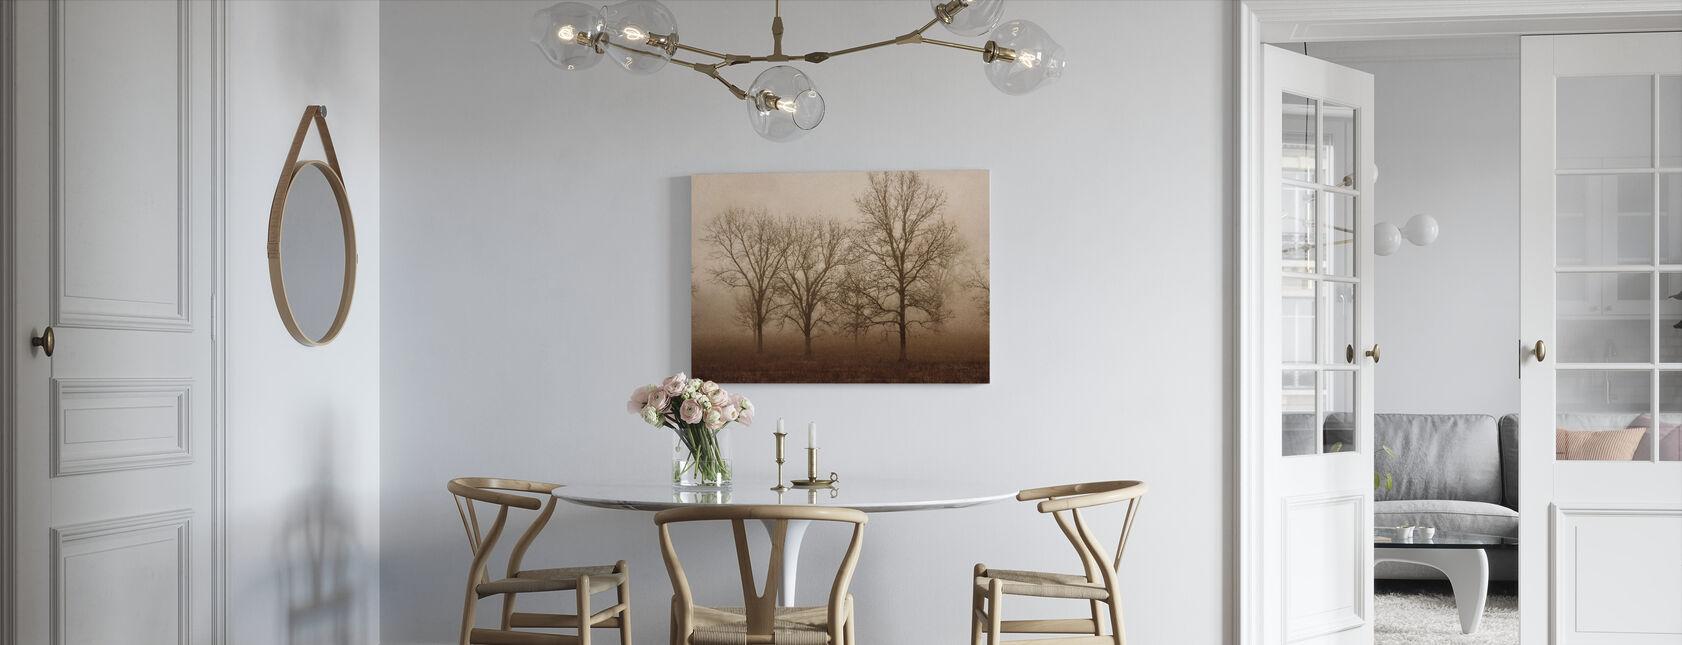 Morning Calm II - Canvas print - Kitchen